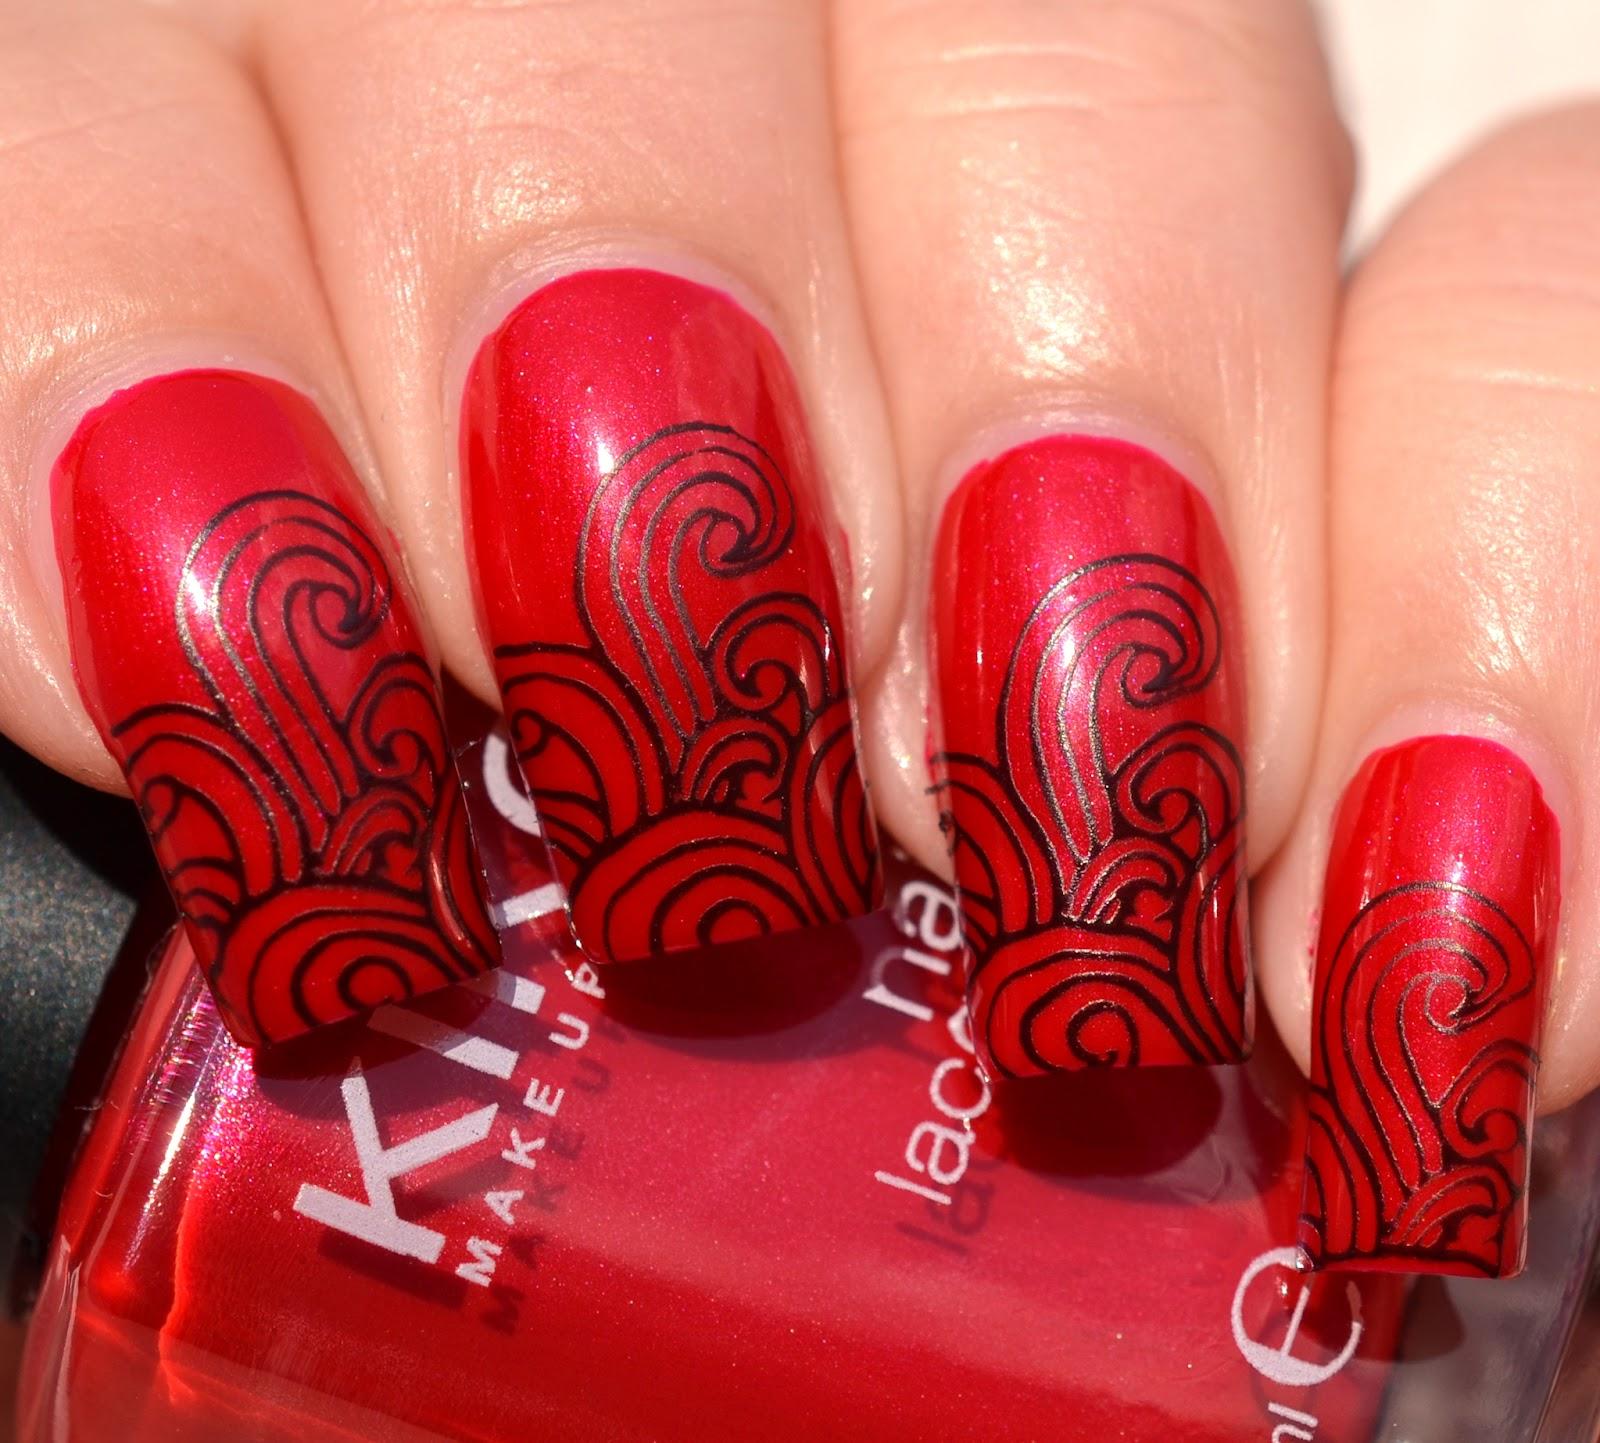 http://lenas-sofa.blogspot.de/2015/04/kiko-nail-lacquer-285-scarlet-red.html